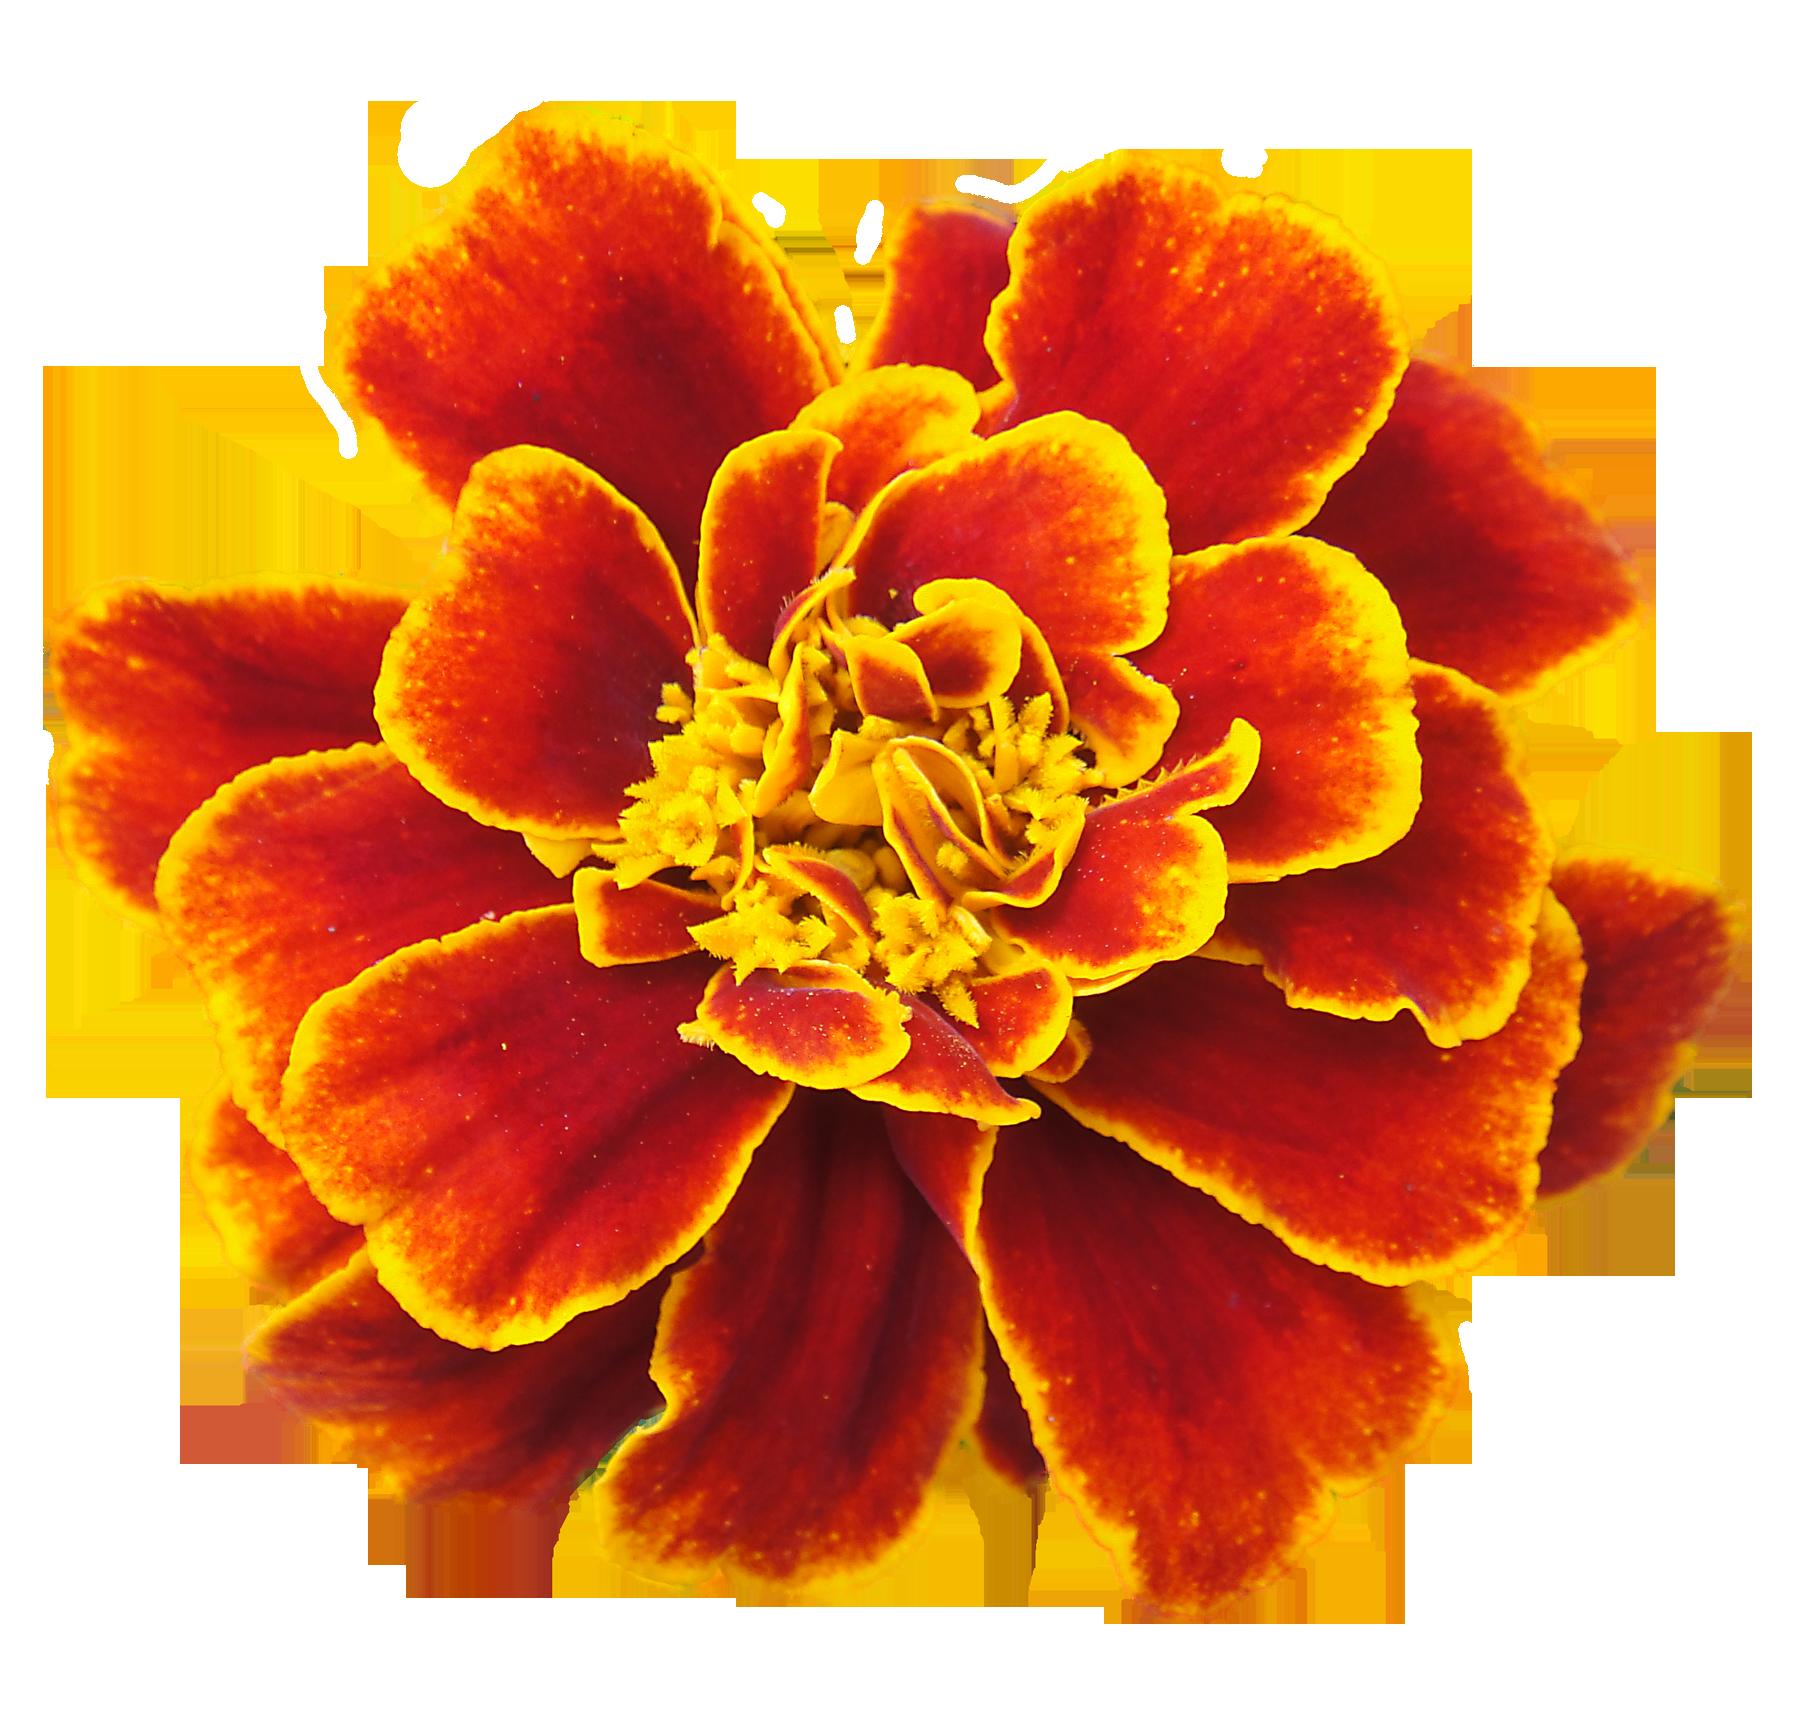 Marigold flower clipart clip art black and white download San Francisco Marigolds | Pinterest | Marigold, San francisco and Tattoo clip art black and white download